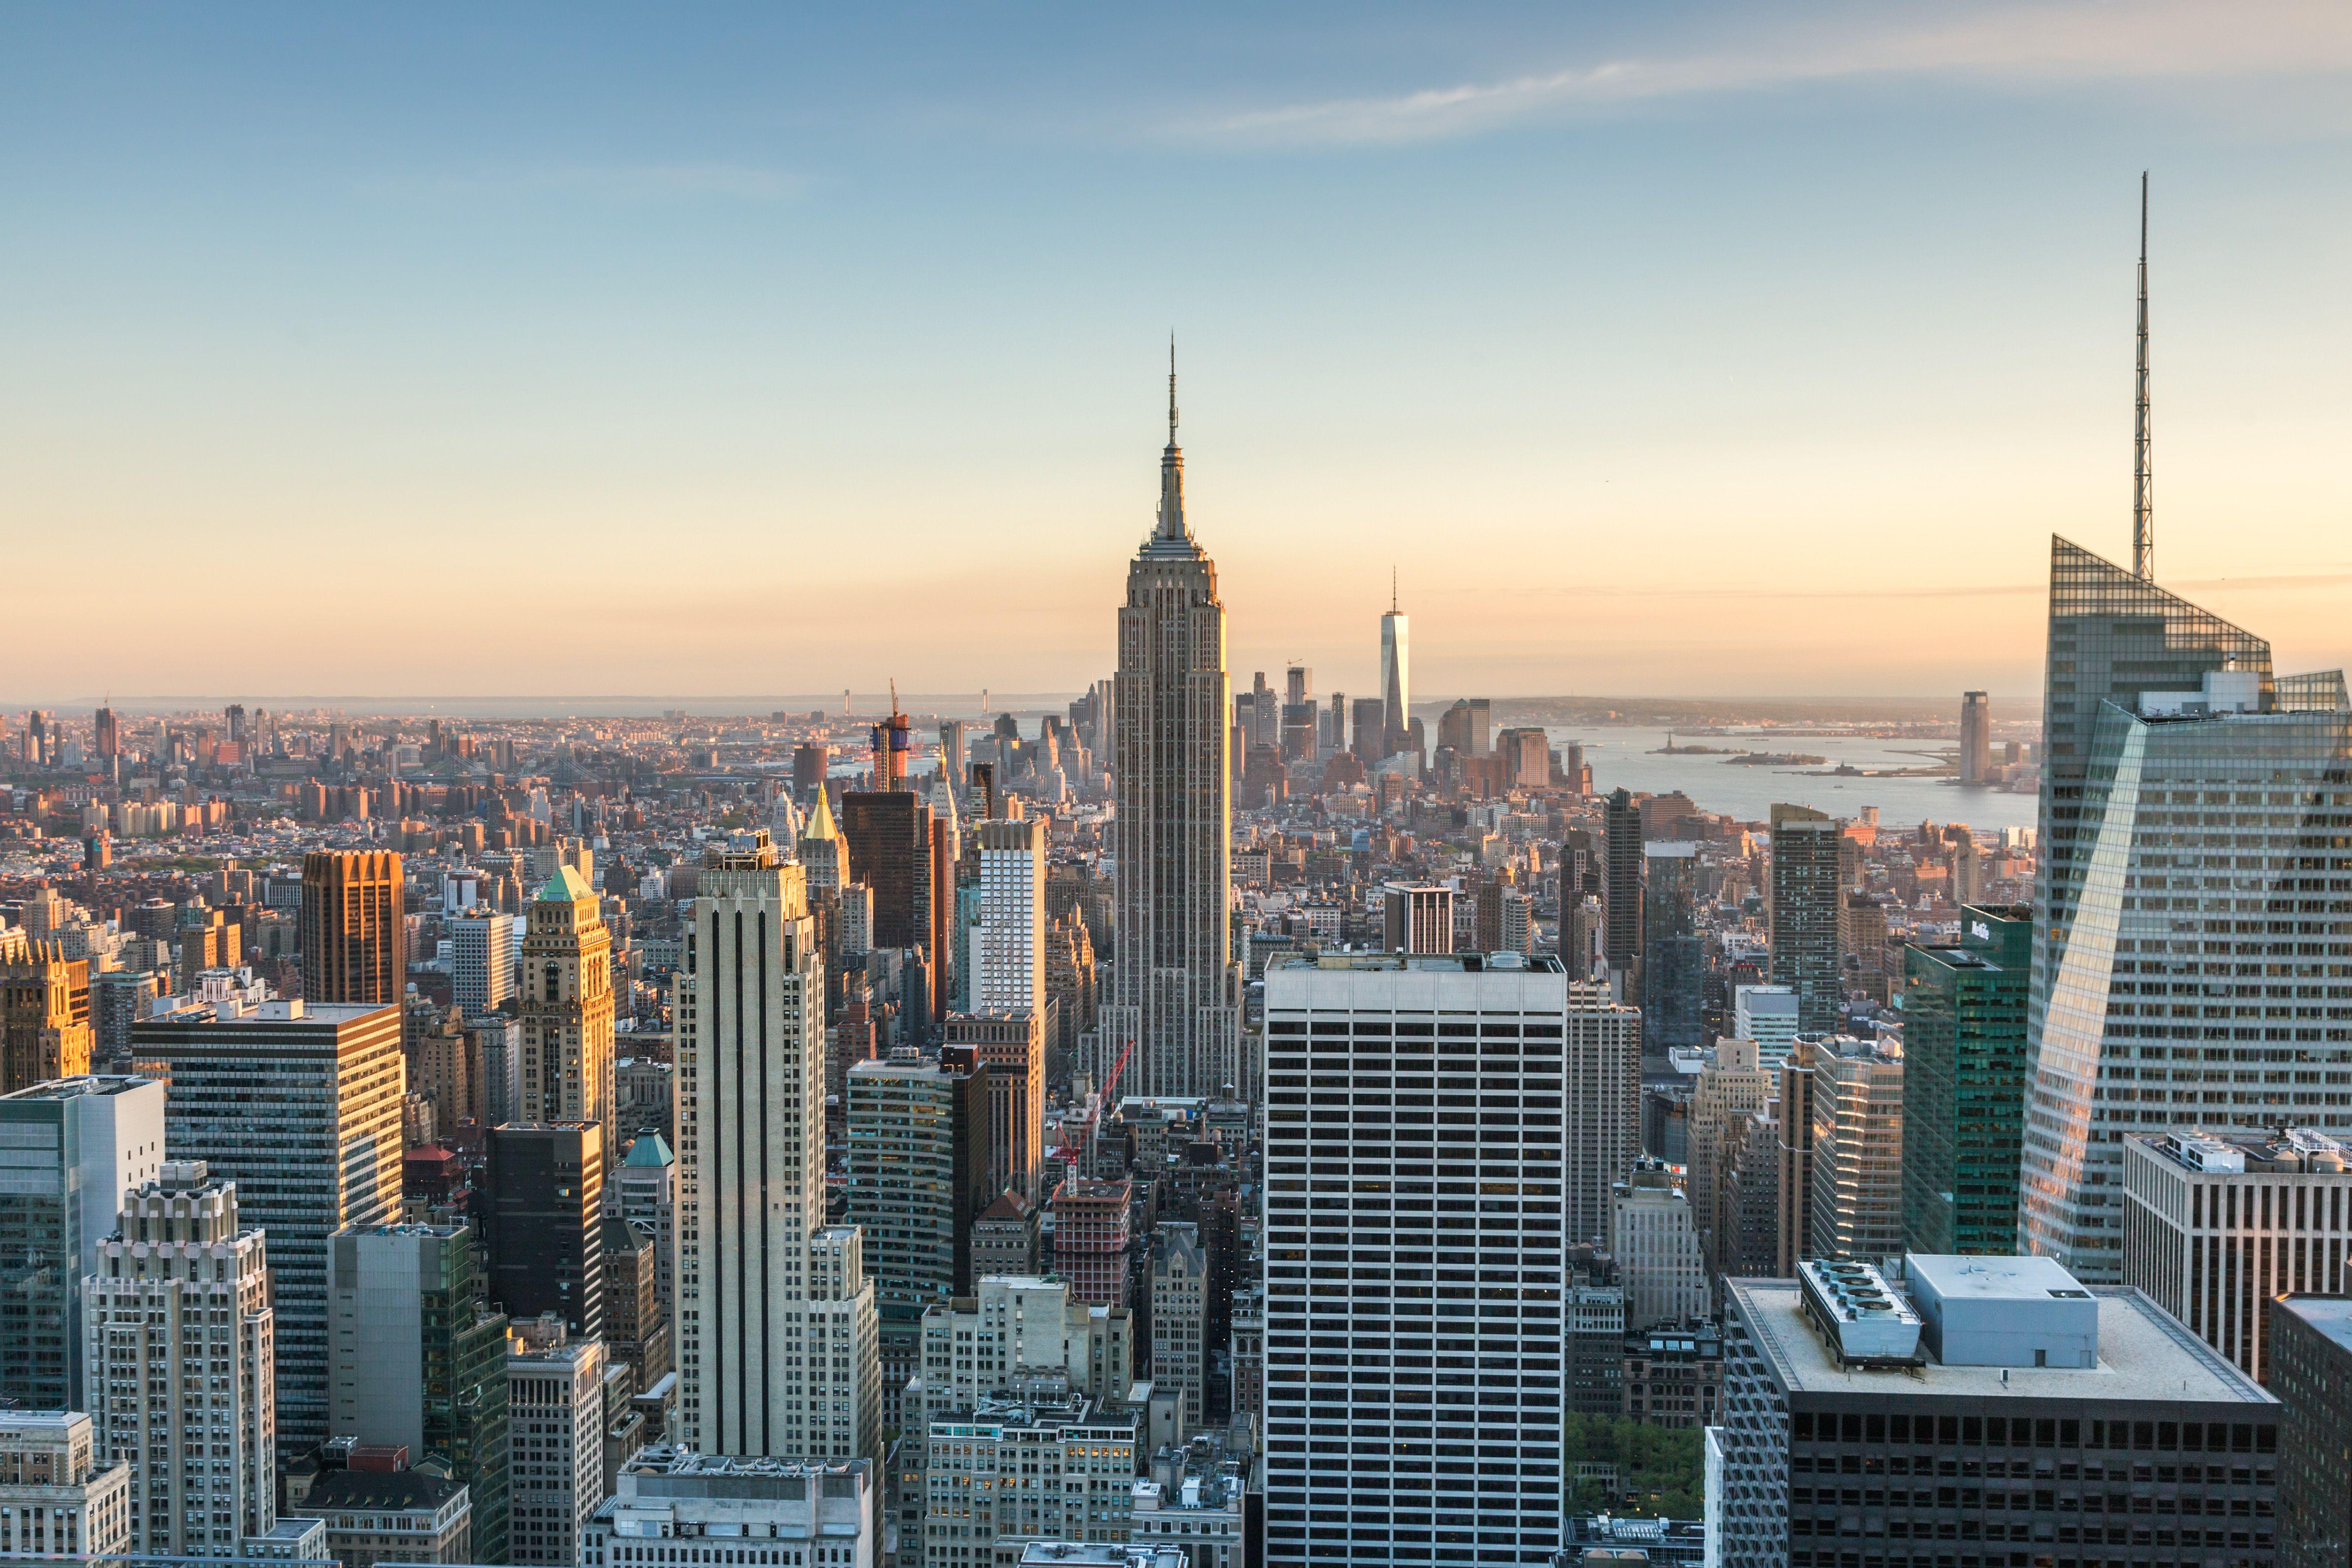 Empire State building and skyline, New York, USA